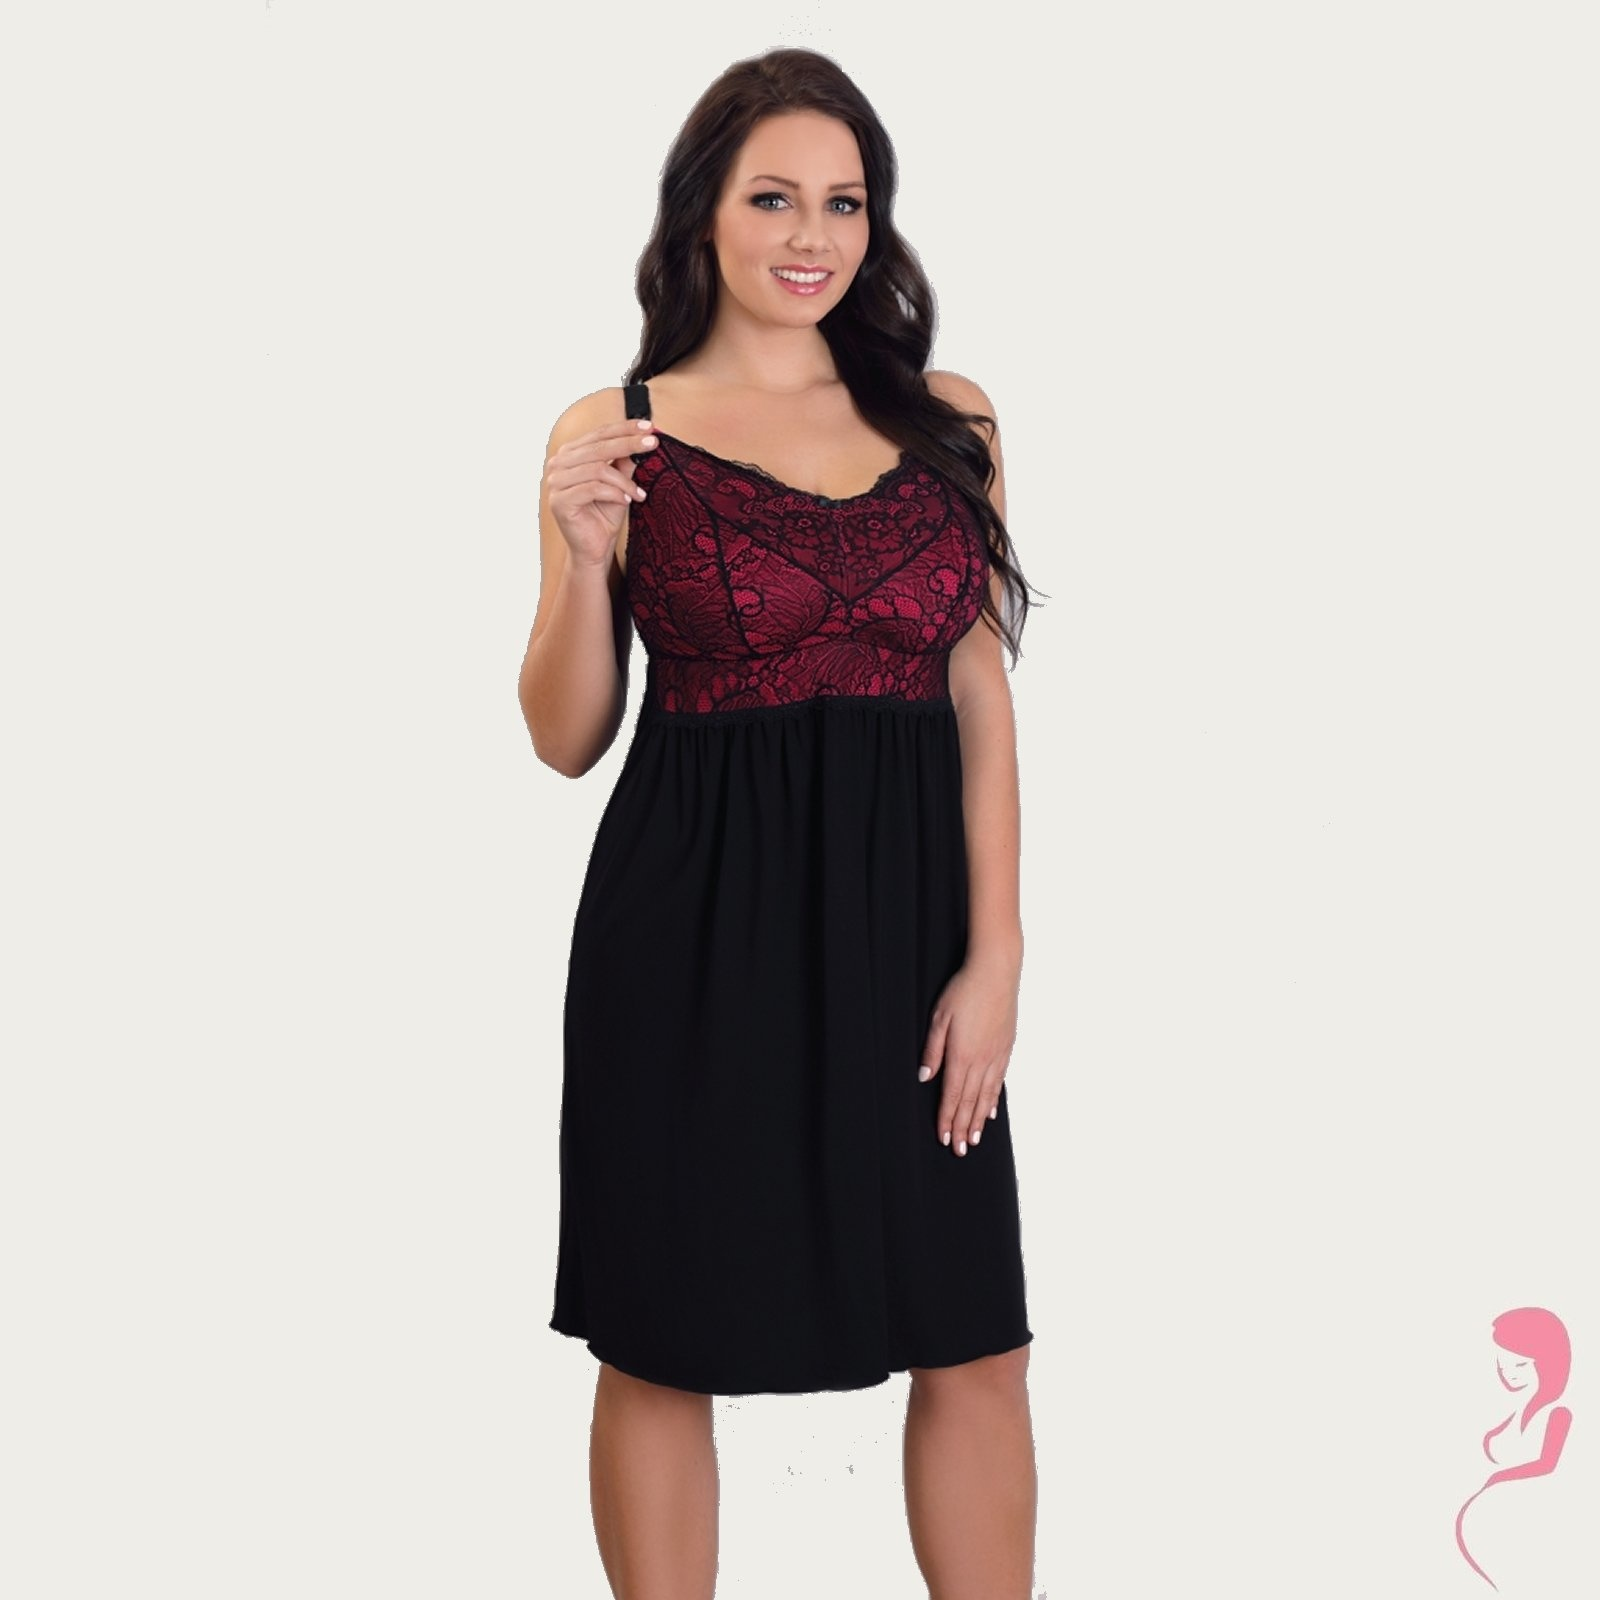 Lupoline Zwangerschapsjurk - Voedingsjurk Sexy Black